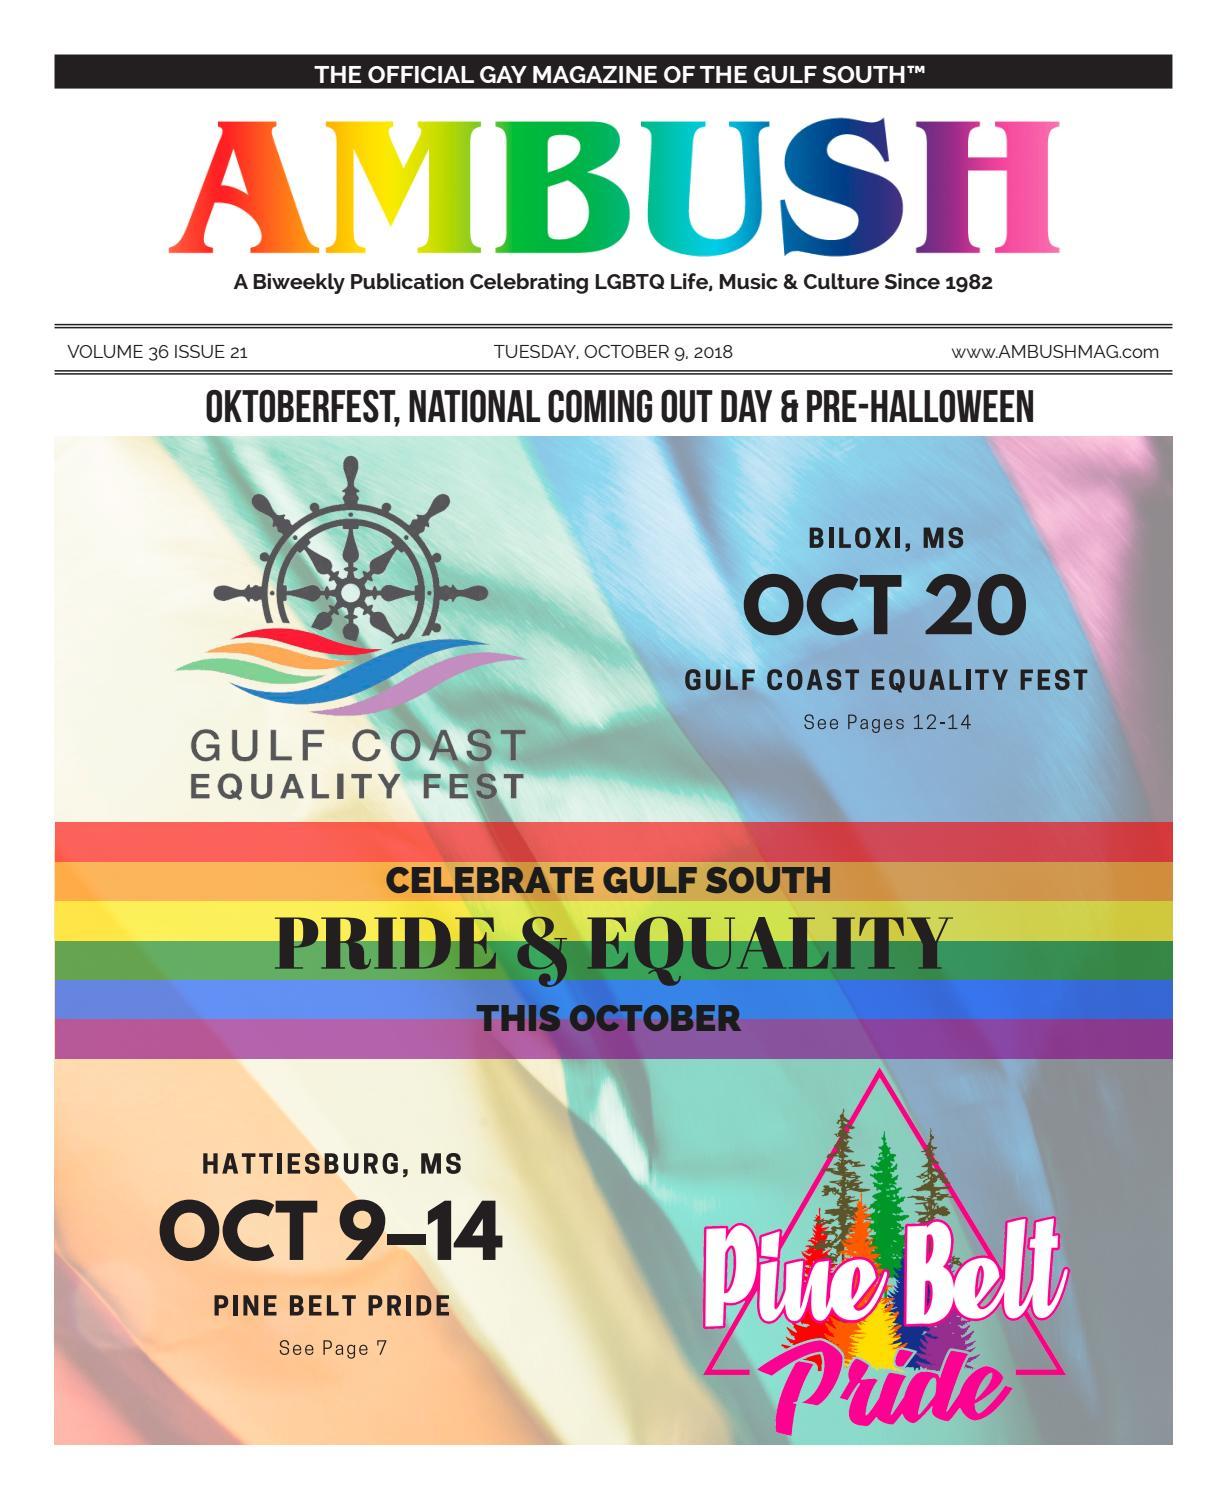 7ea4a9665f1c Ambush Magazine Volume 36 Issue 21 by Ambush Publishing - issuu